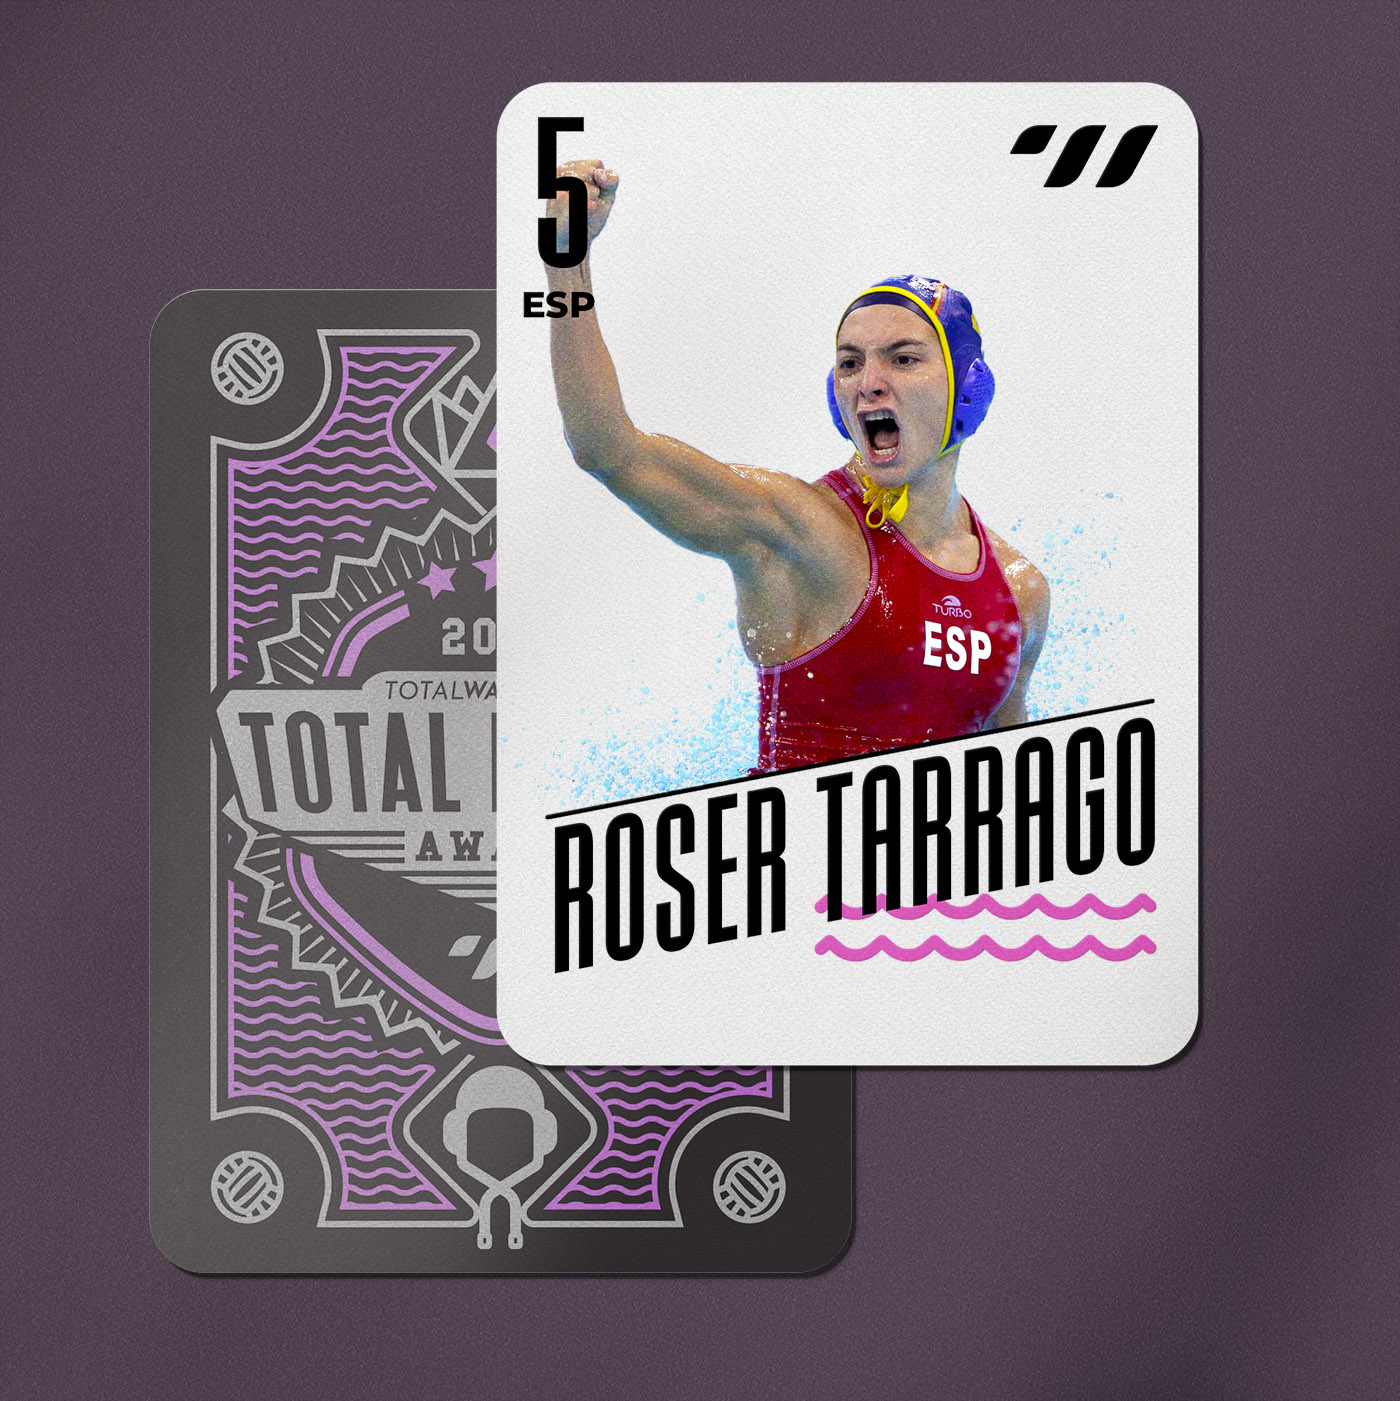 LEFT SIDE - Roser Tarrago (ESP)